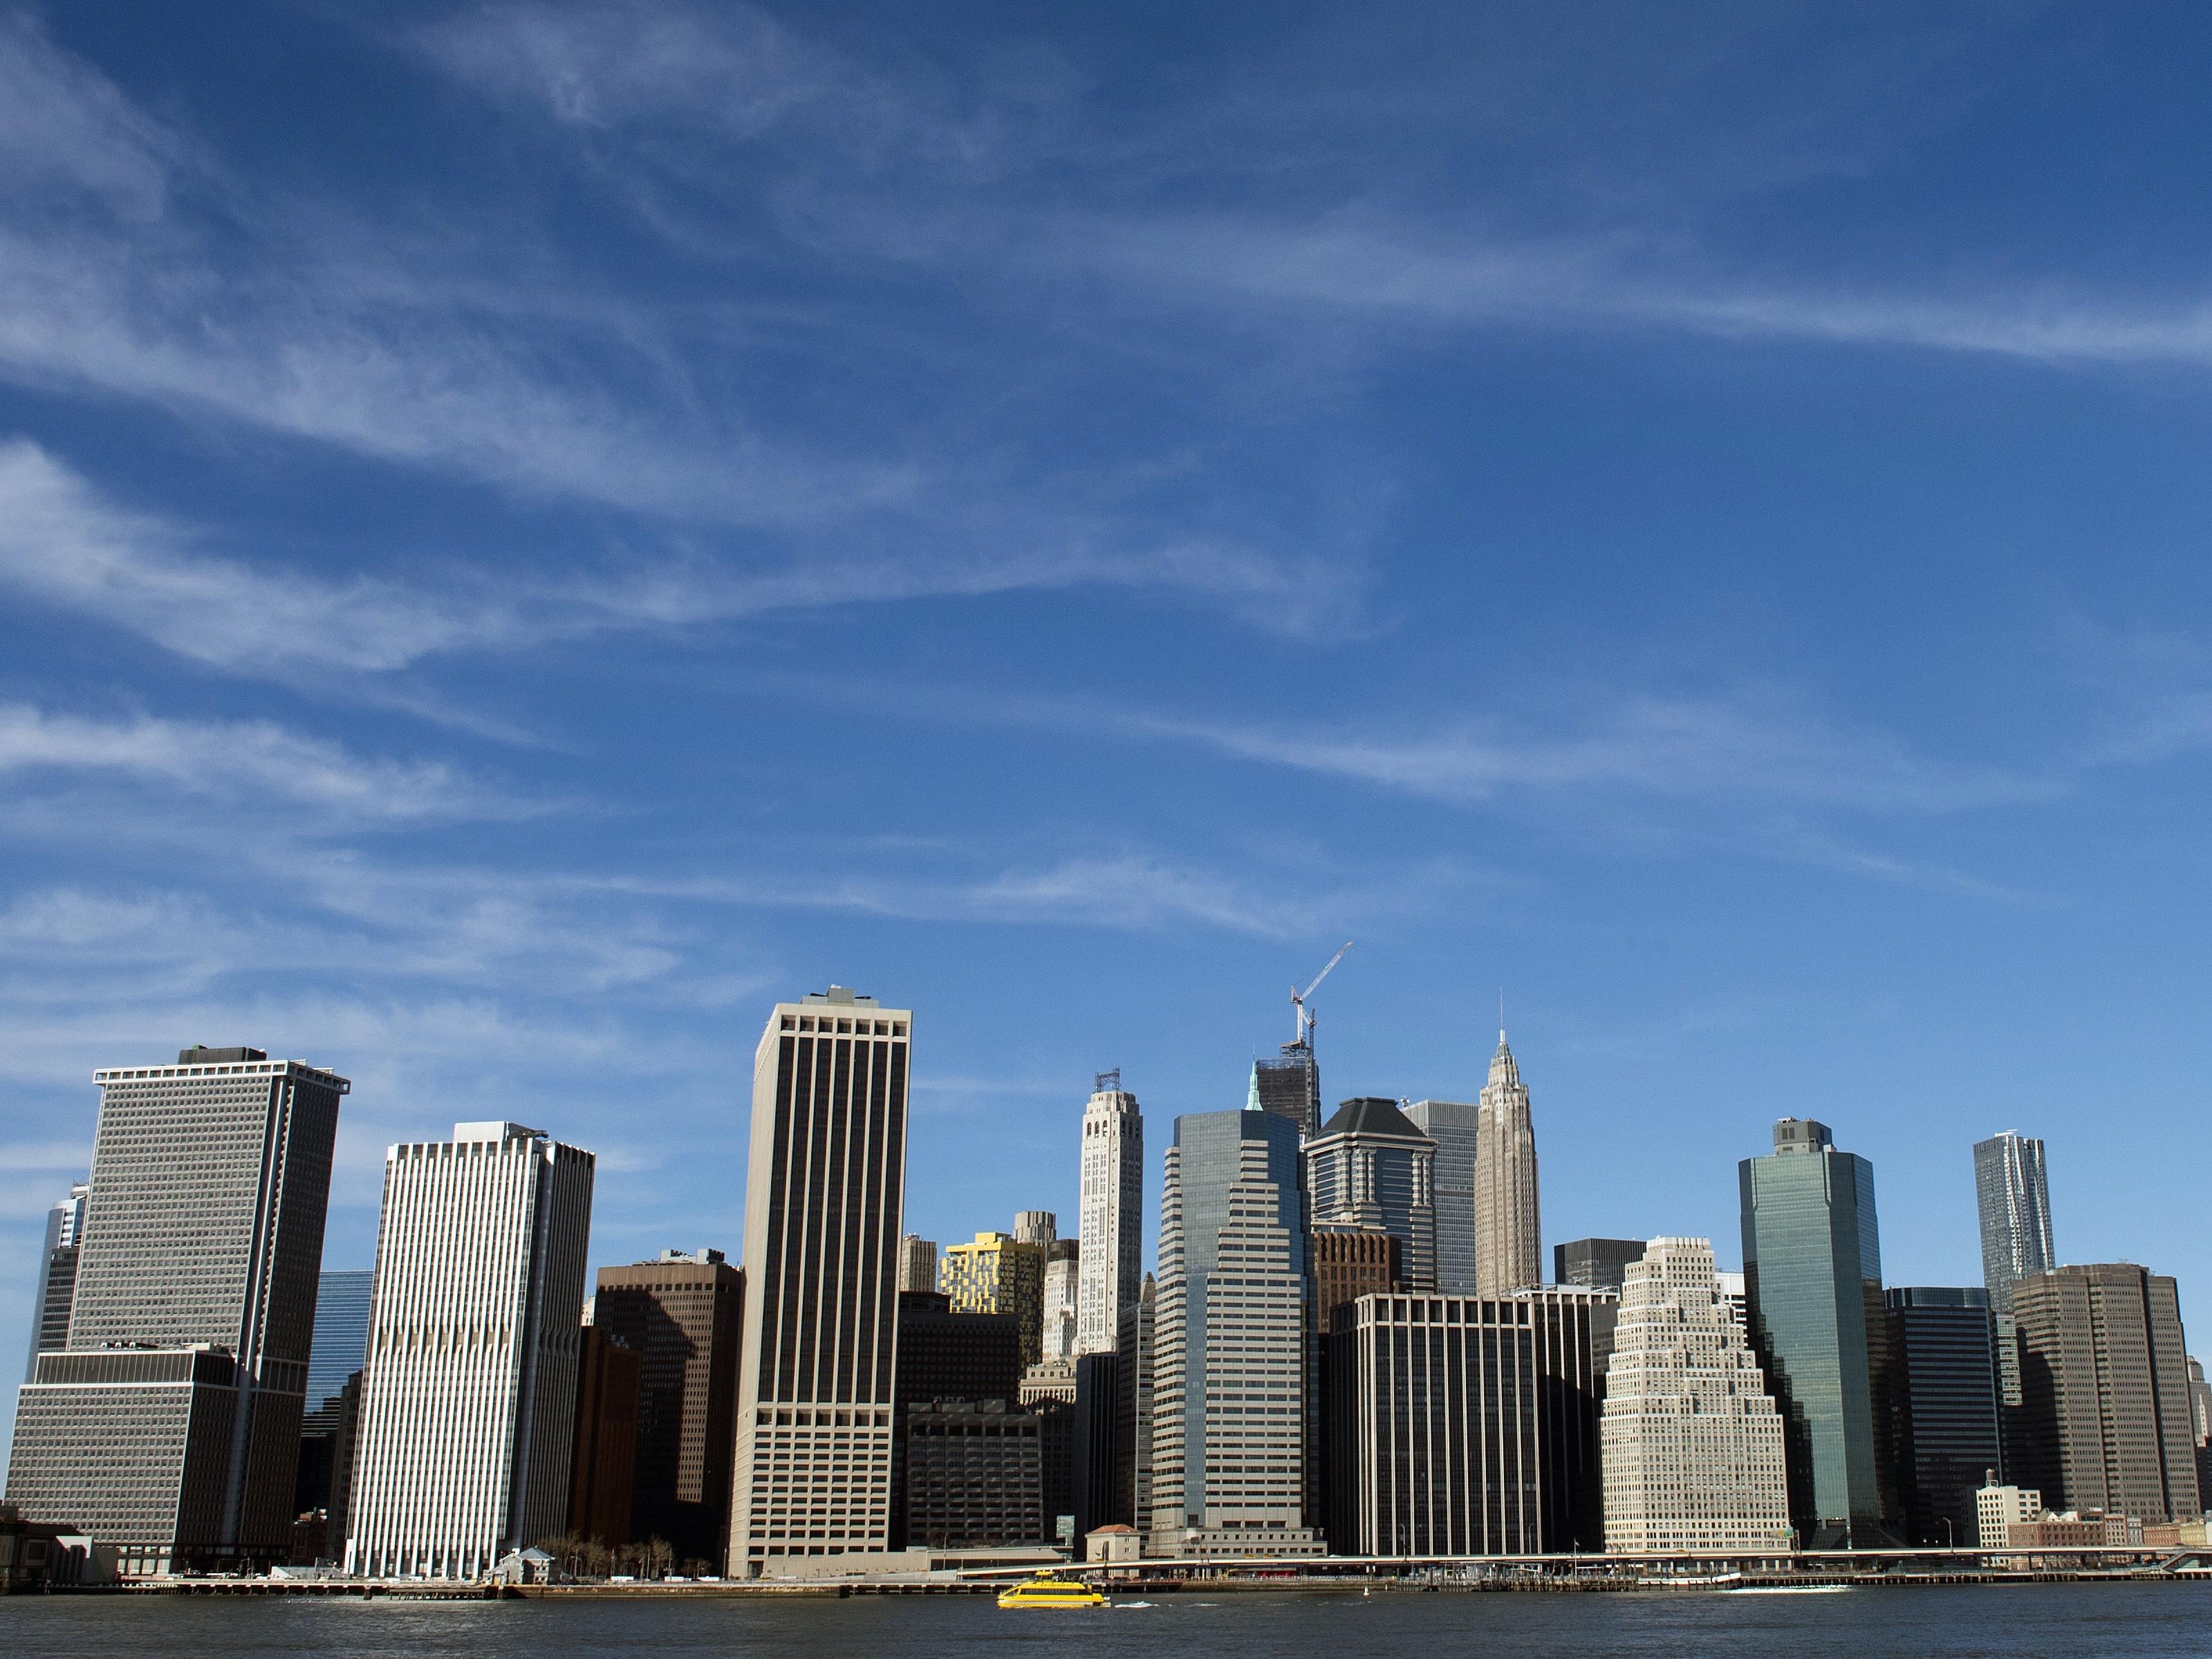 US-NEWYORK-WATERFRONT